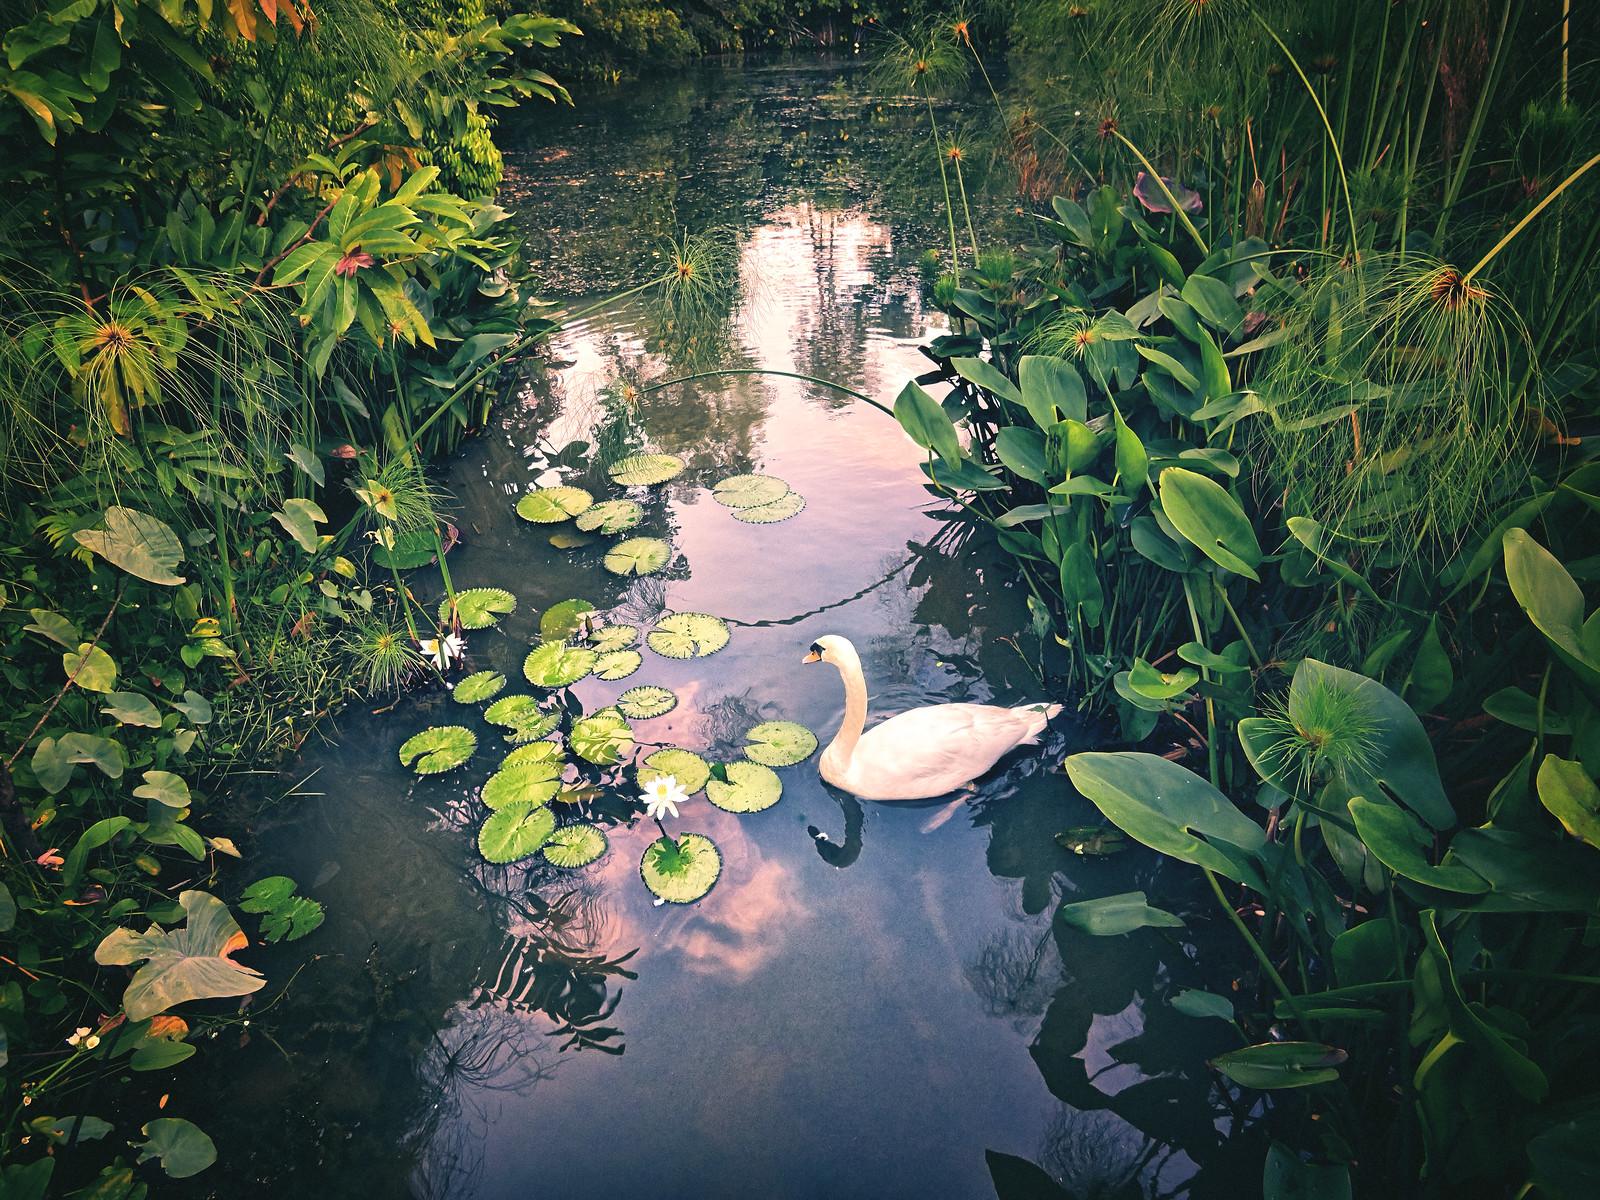 A Swan at Botanical Gardens Singapore